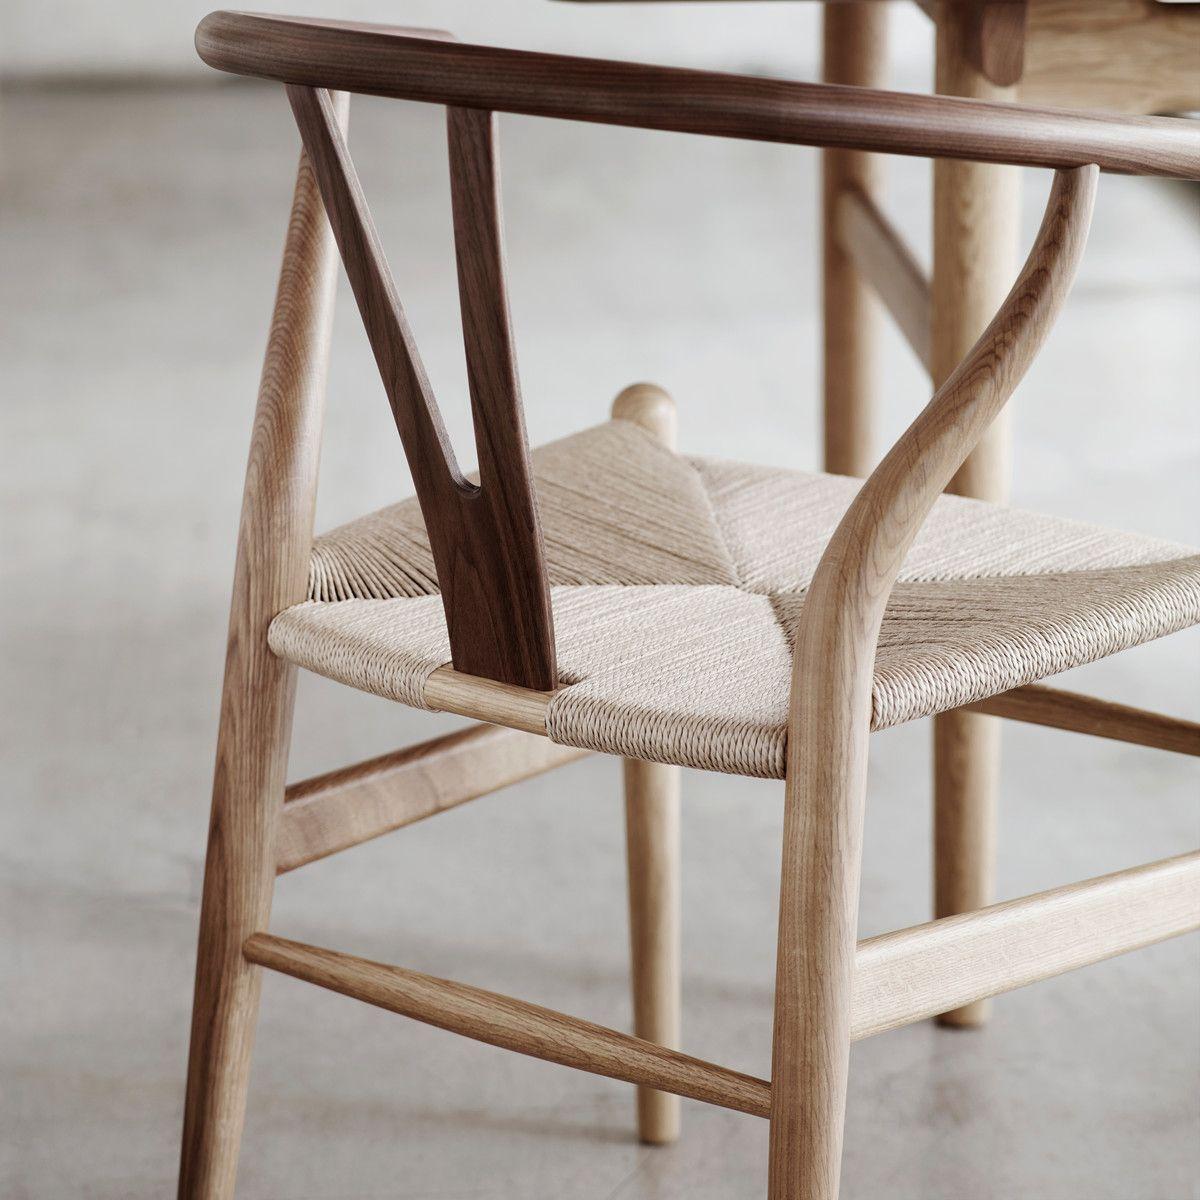 Carl Hansen Ch24 Wishbone Chair Eiche Geseift